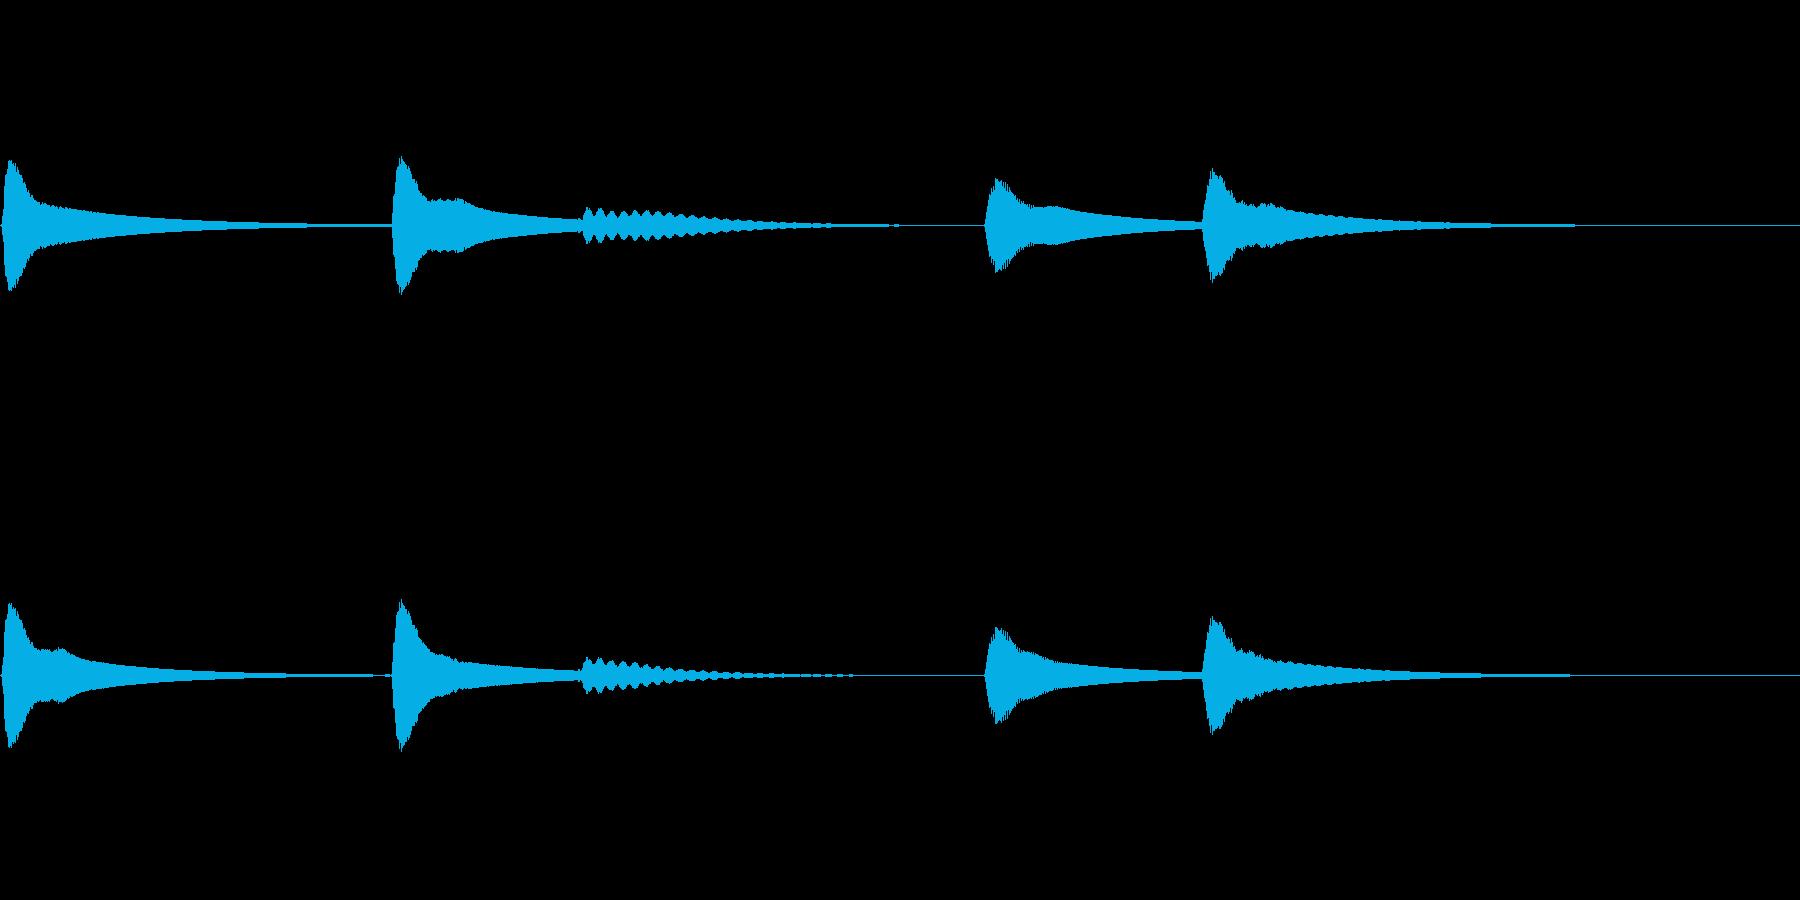 【SE 効果音】ティロティリロリン4の再生済みの波形